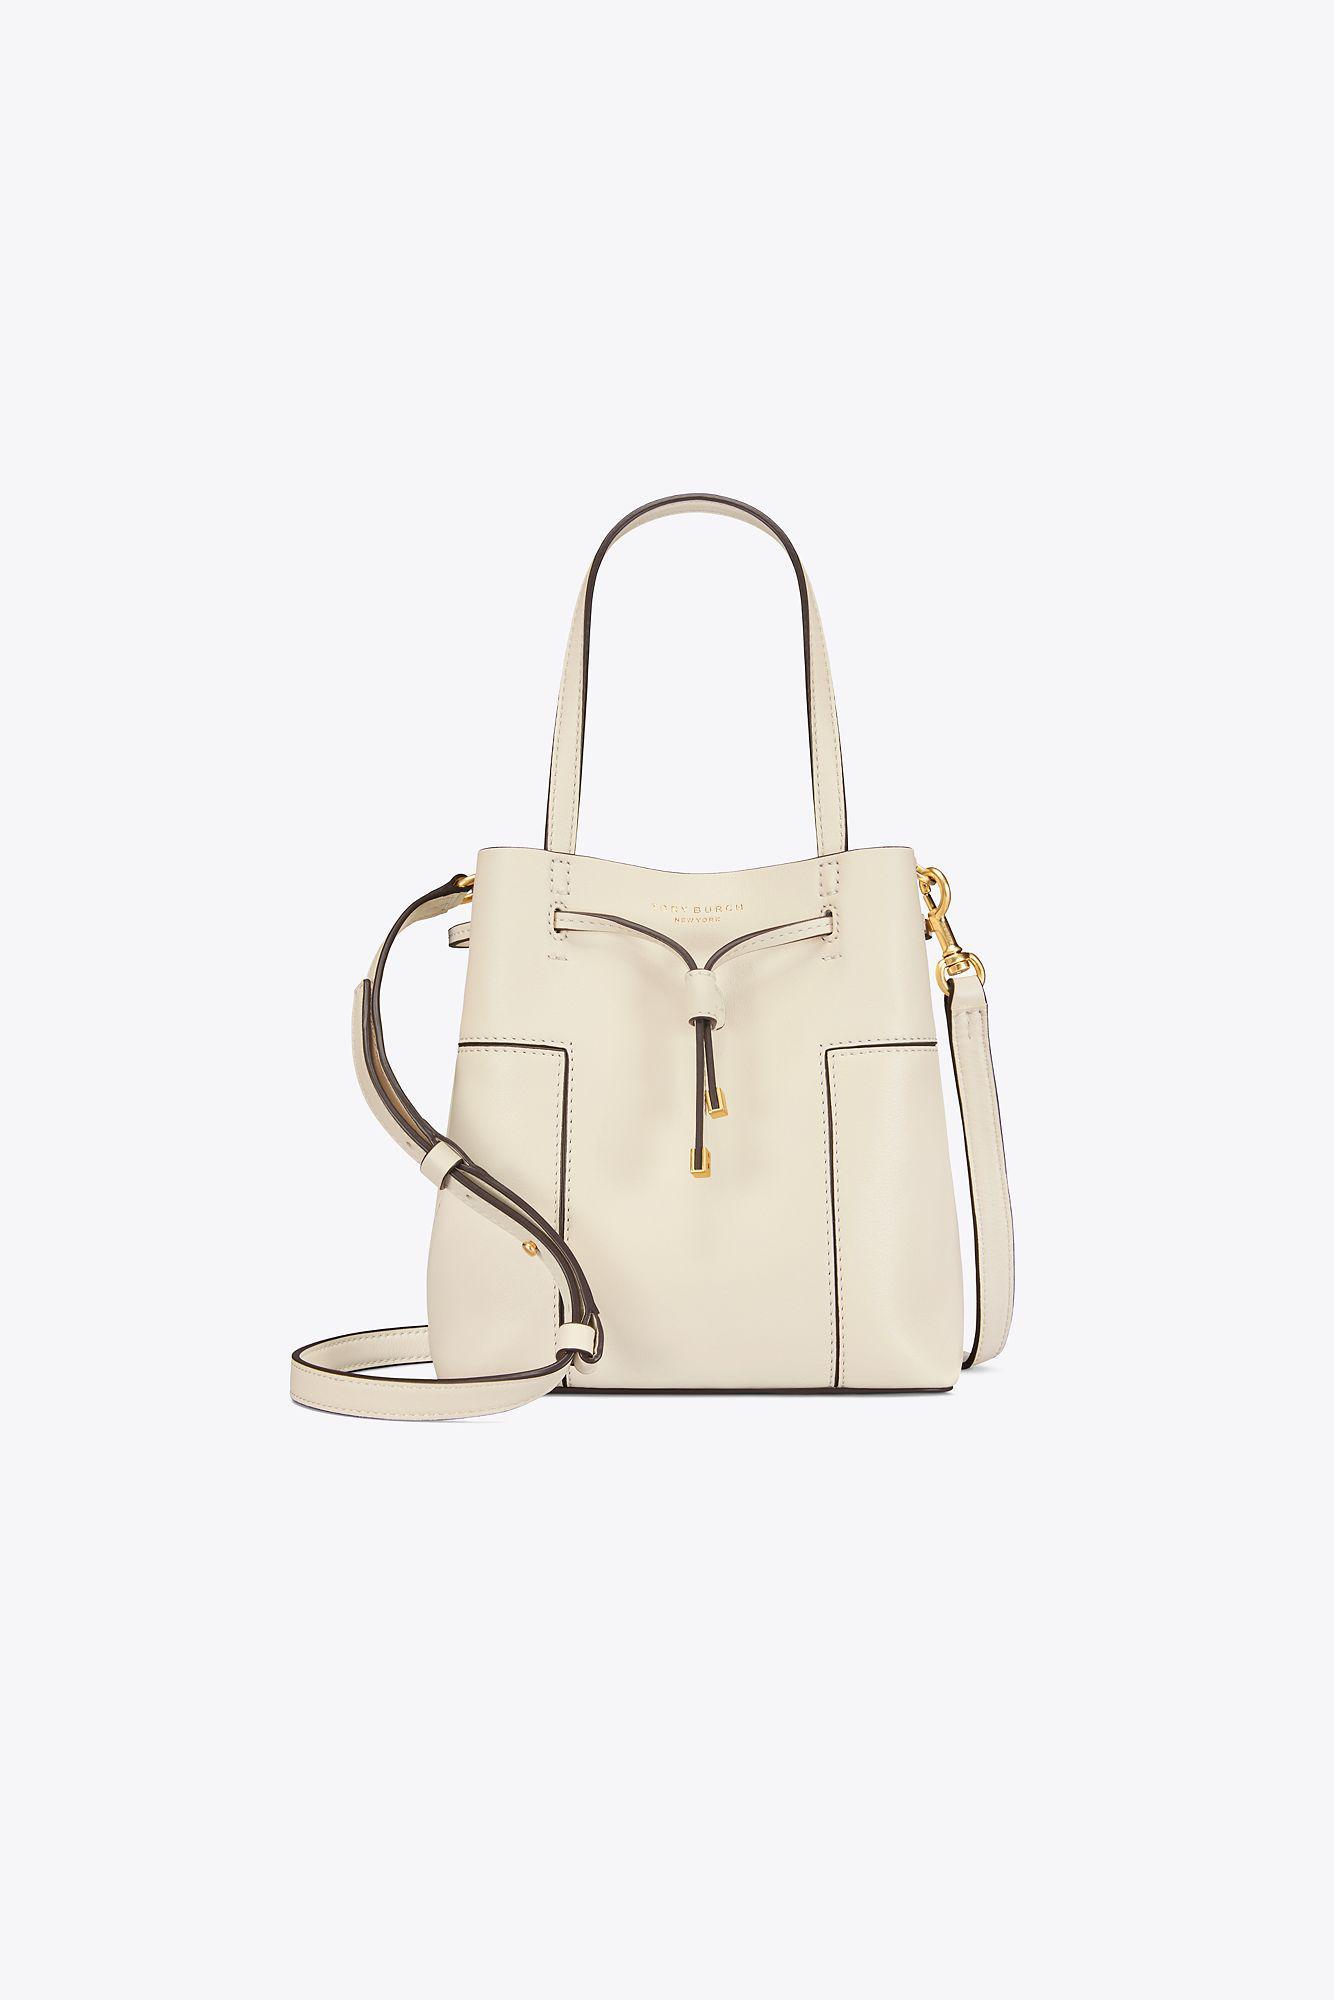 65aee03b2f7 Tory Burch Block-t Small Bucket Bag in Natural - Lyst